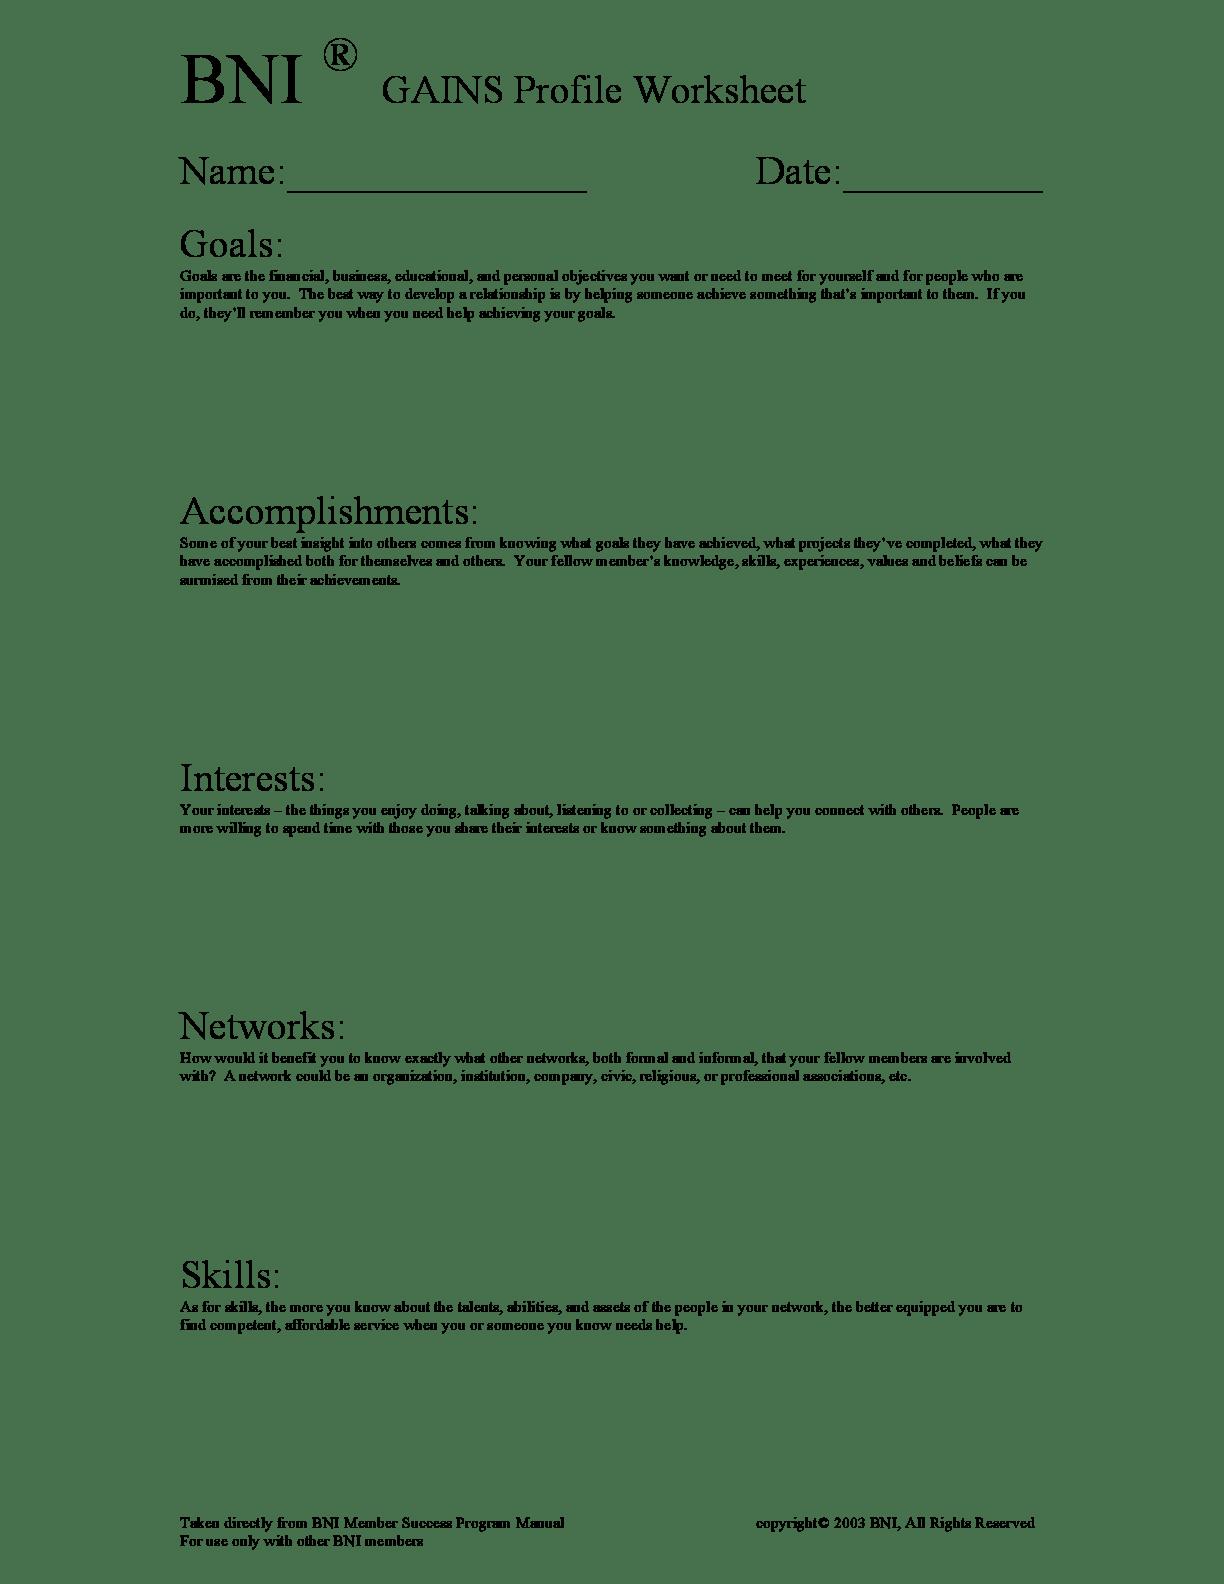 Bni Gains Profile Worksheet Form Fillable Template